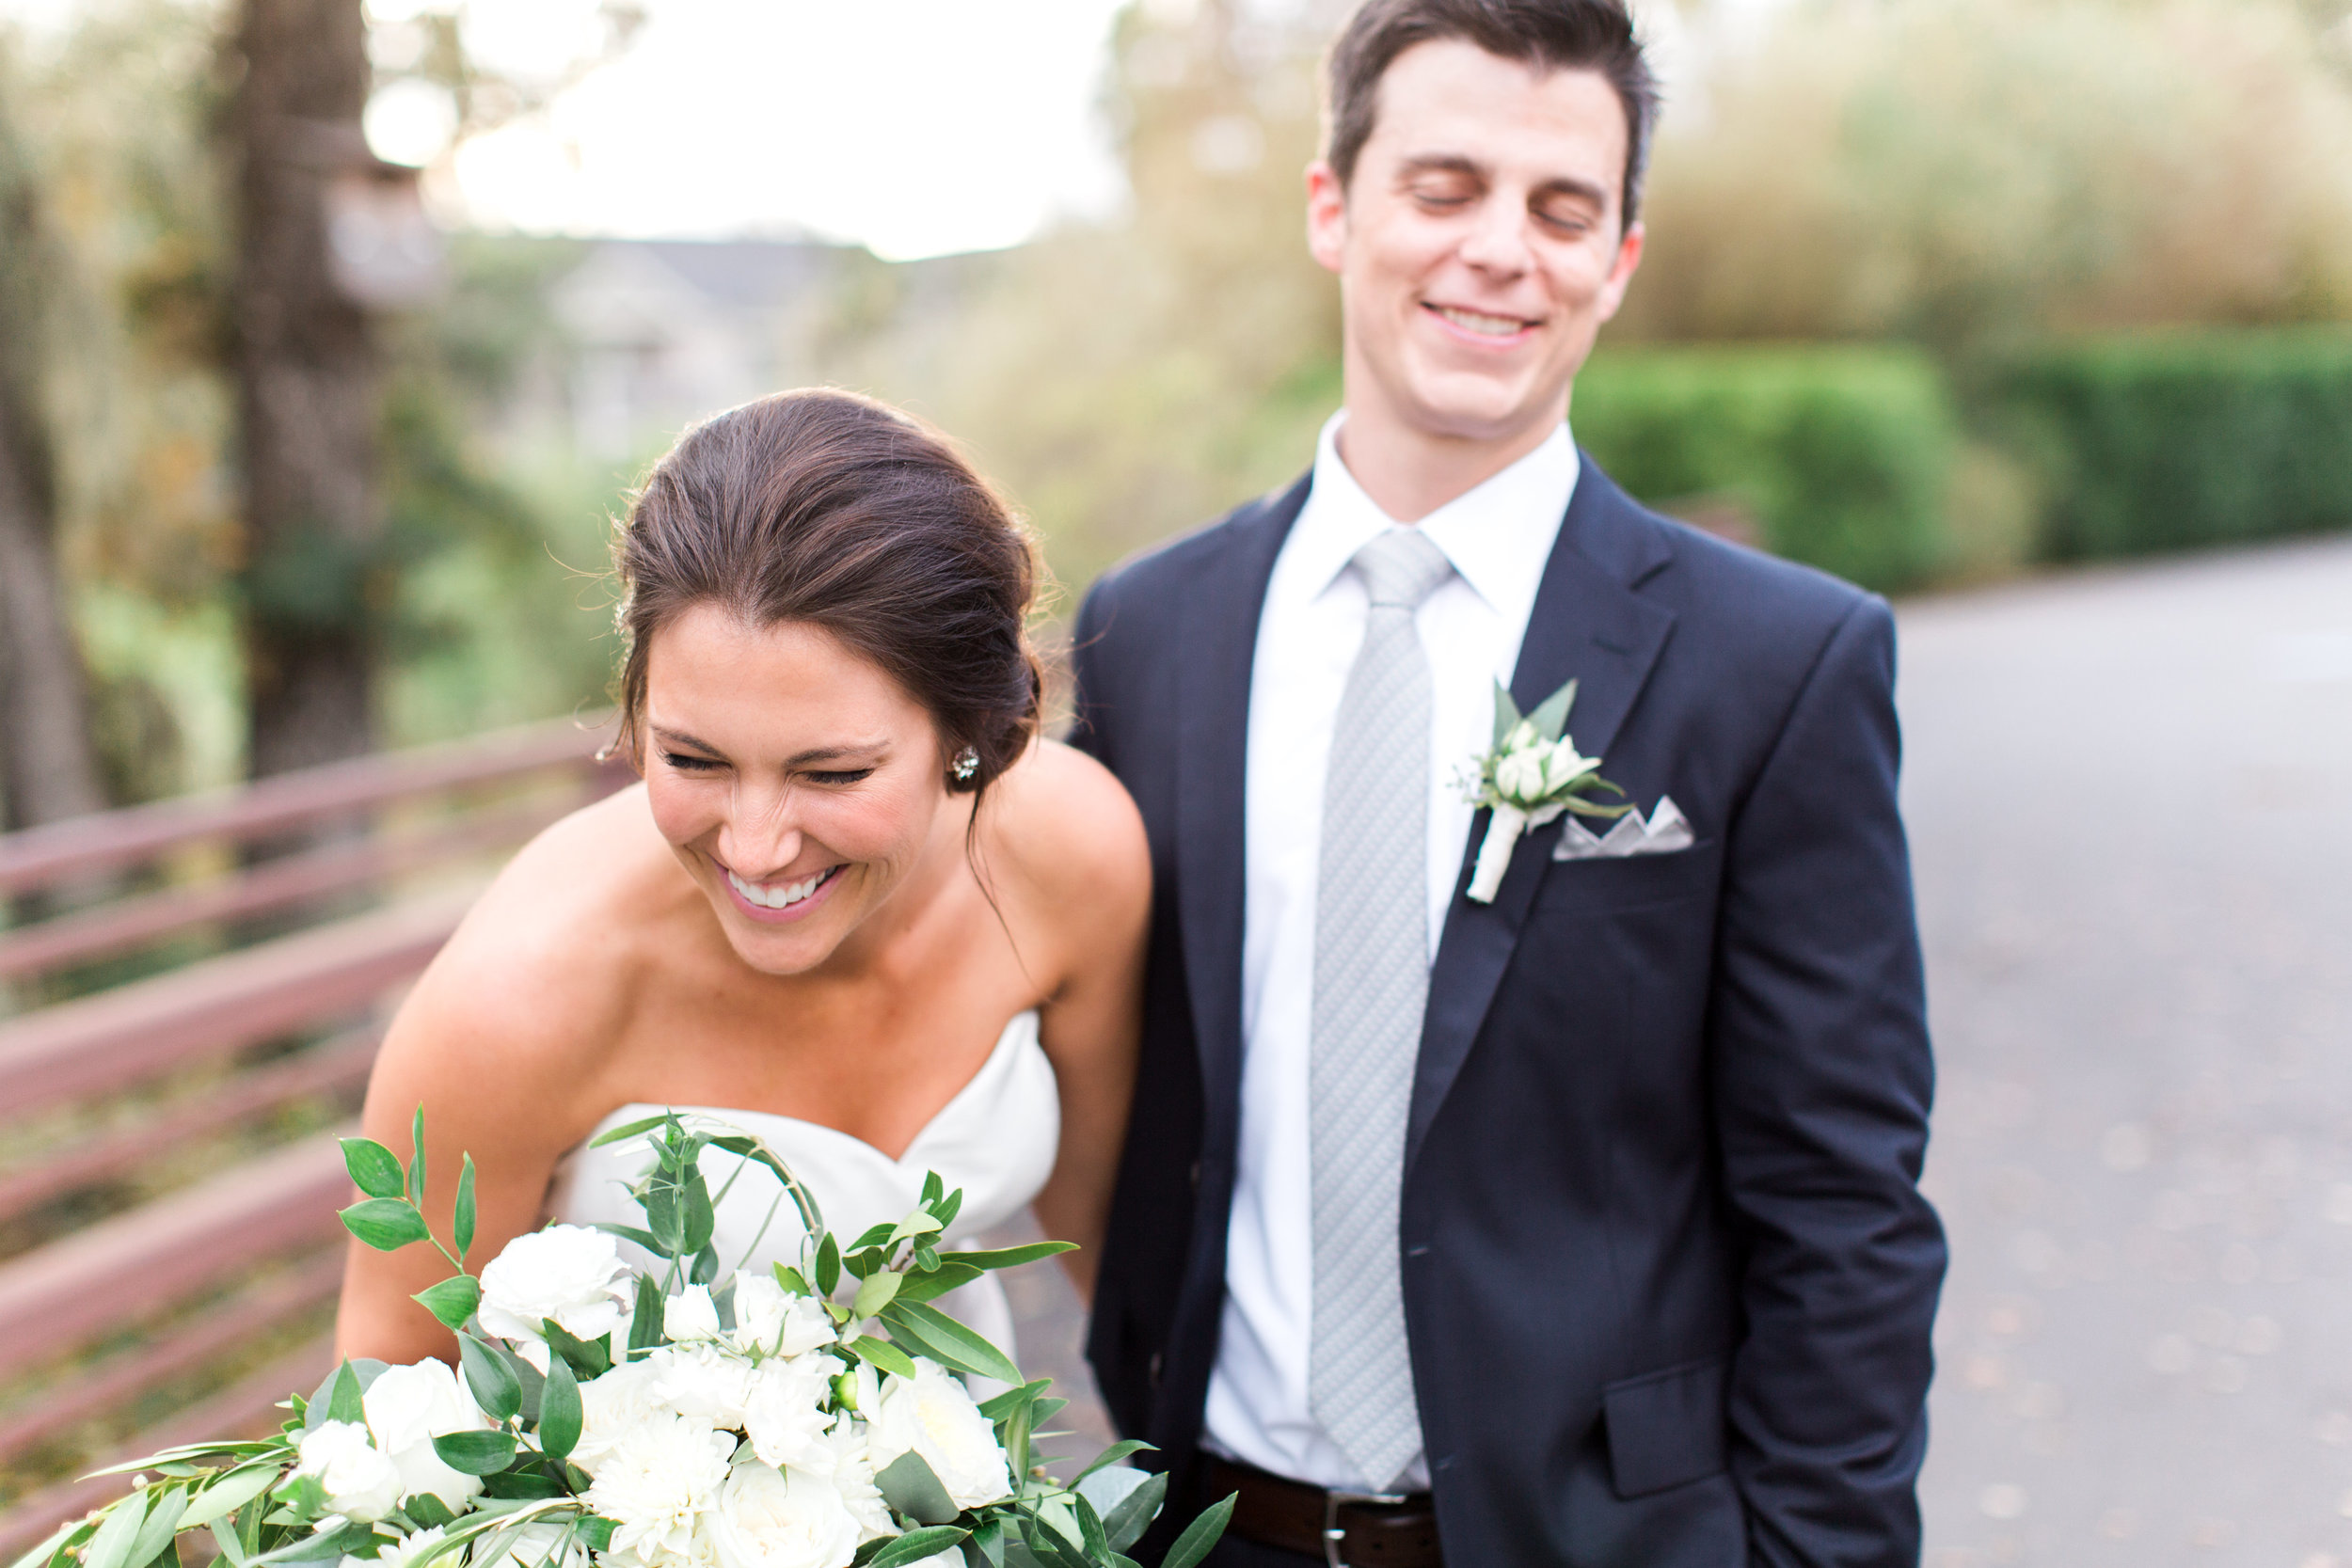 intimate-wedding-at-solage-calistoga-in-napa-84.jpg